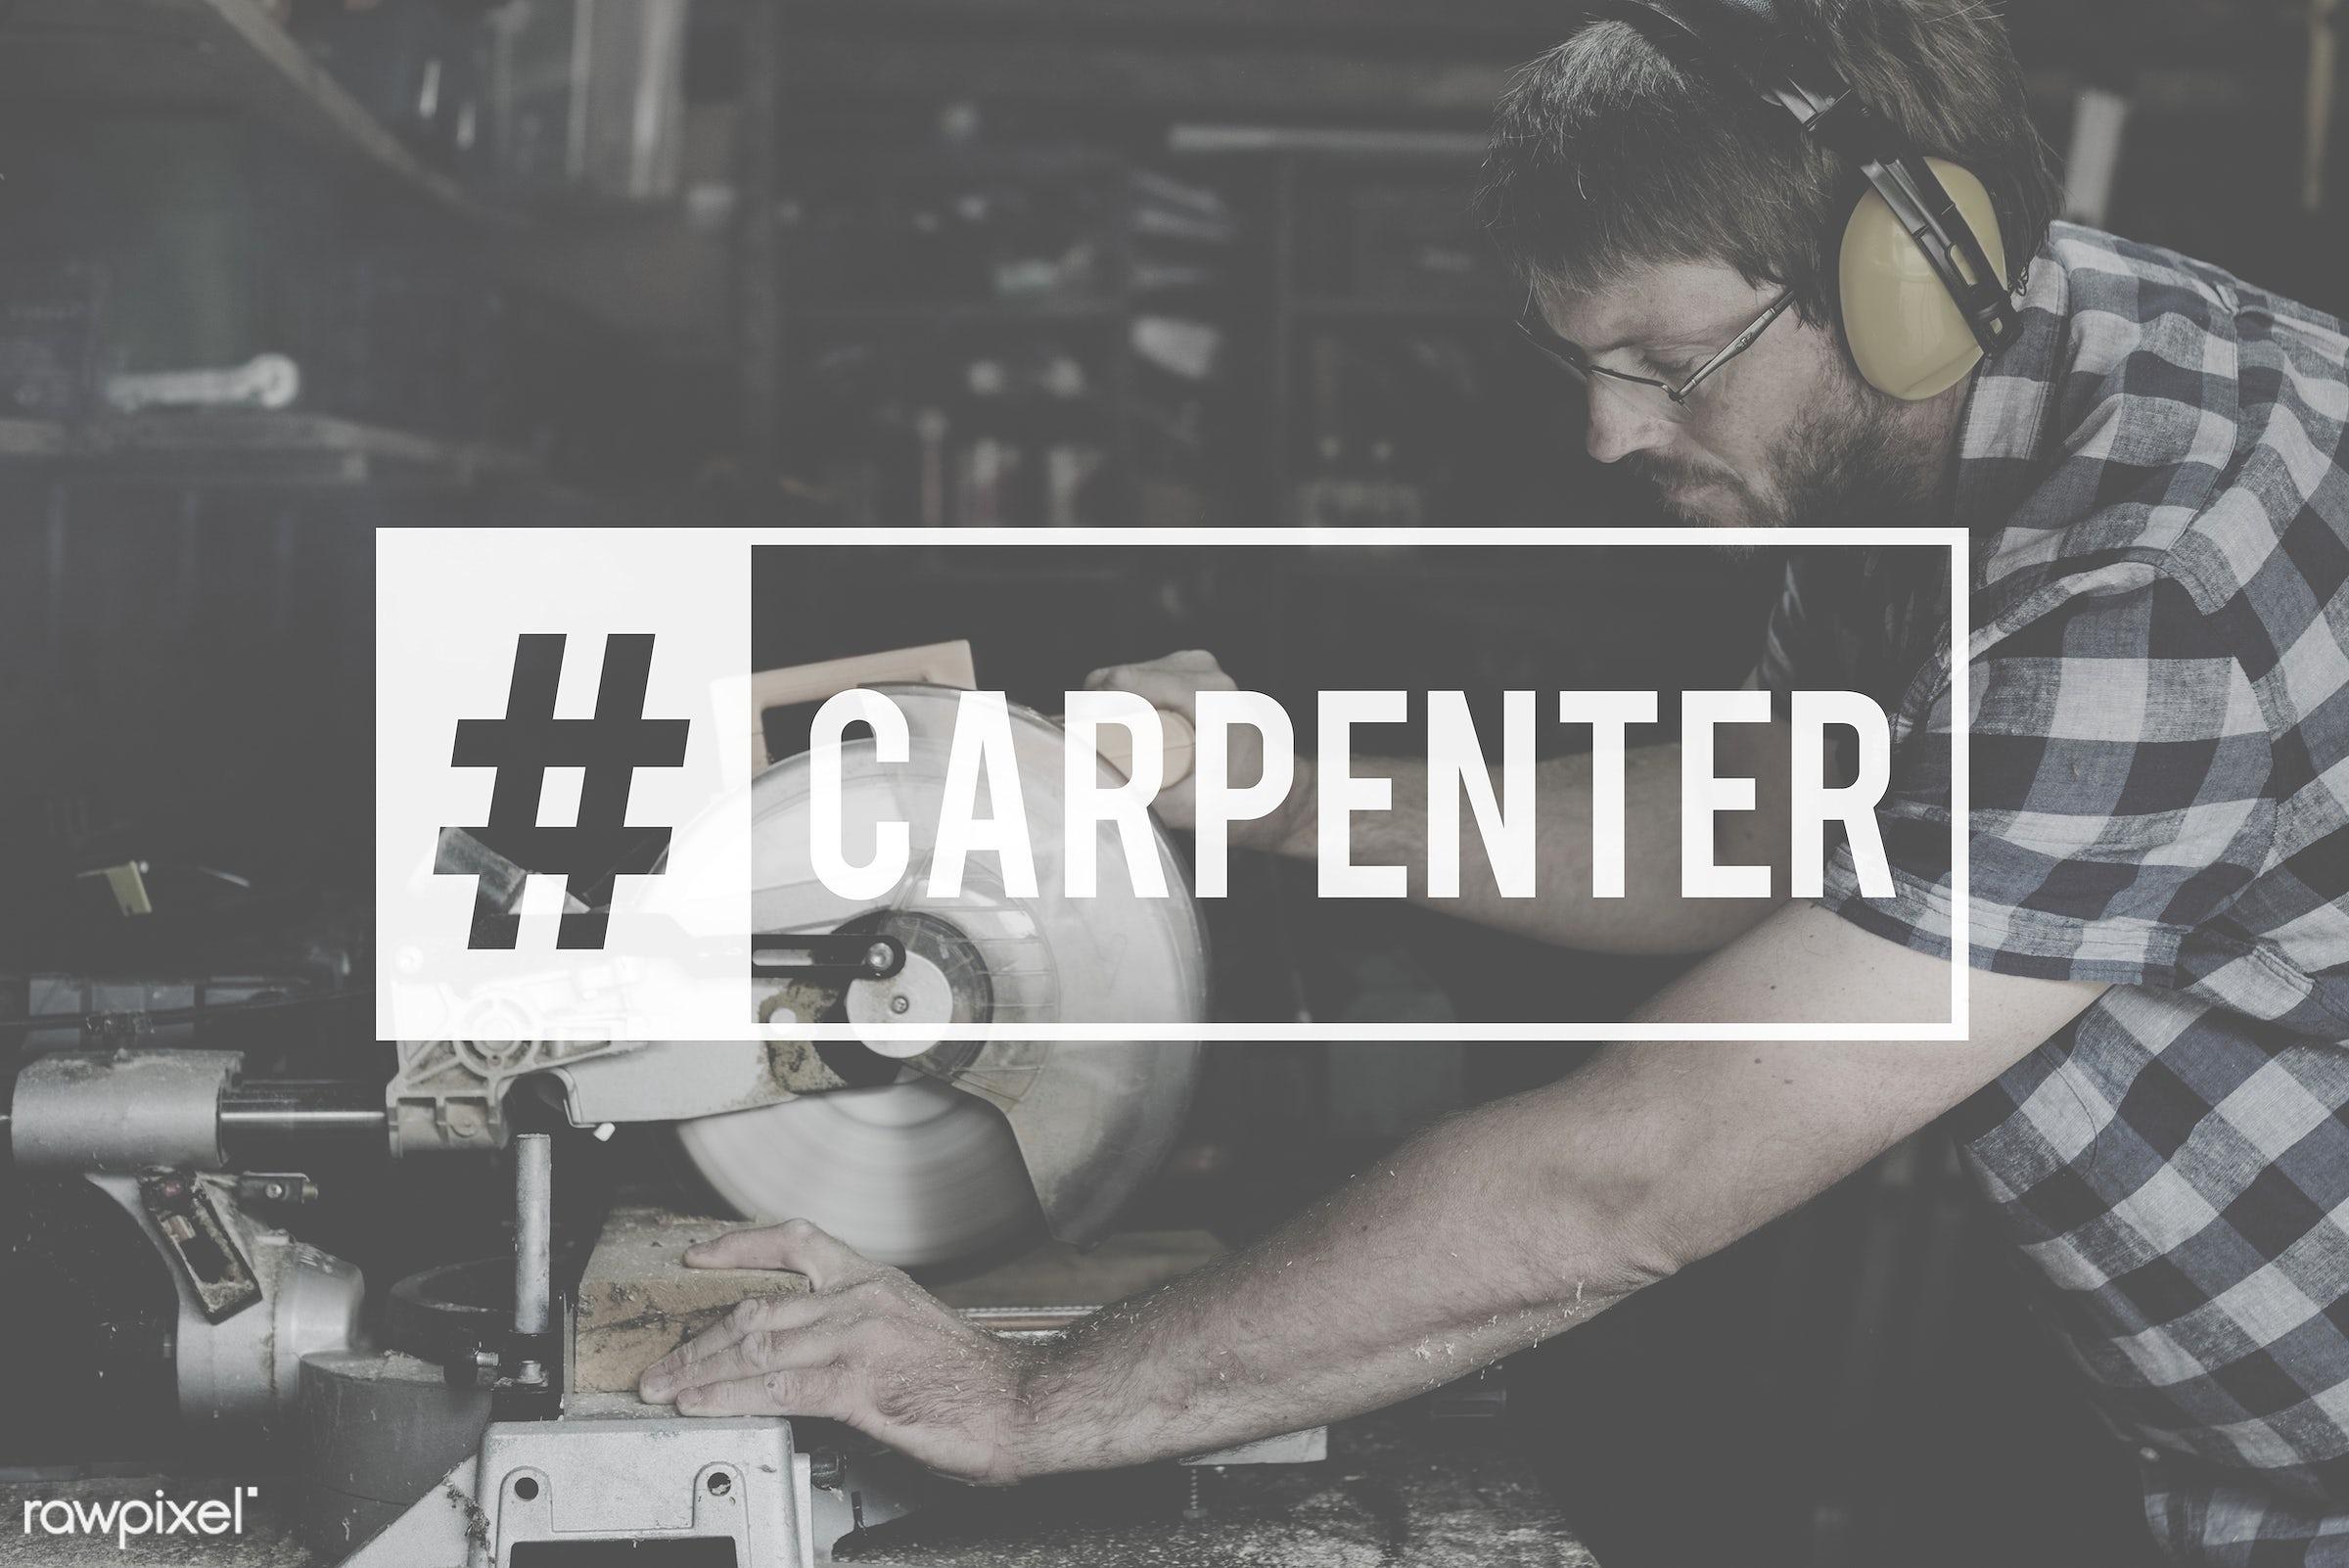 accuracy, aptitude, artistry, carpenter, carpentry, cleverness, craft, craft-man, craftsman, ear muff, equipment, expertness...